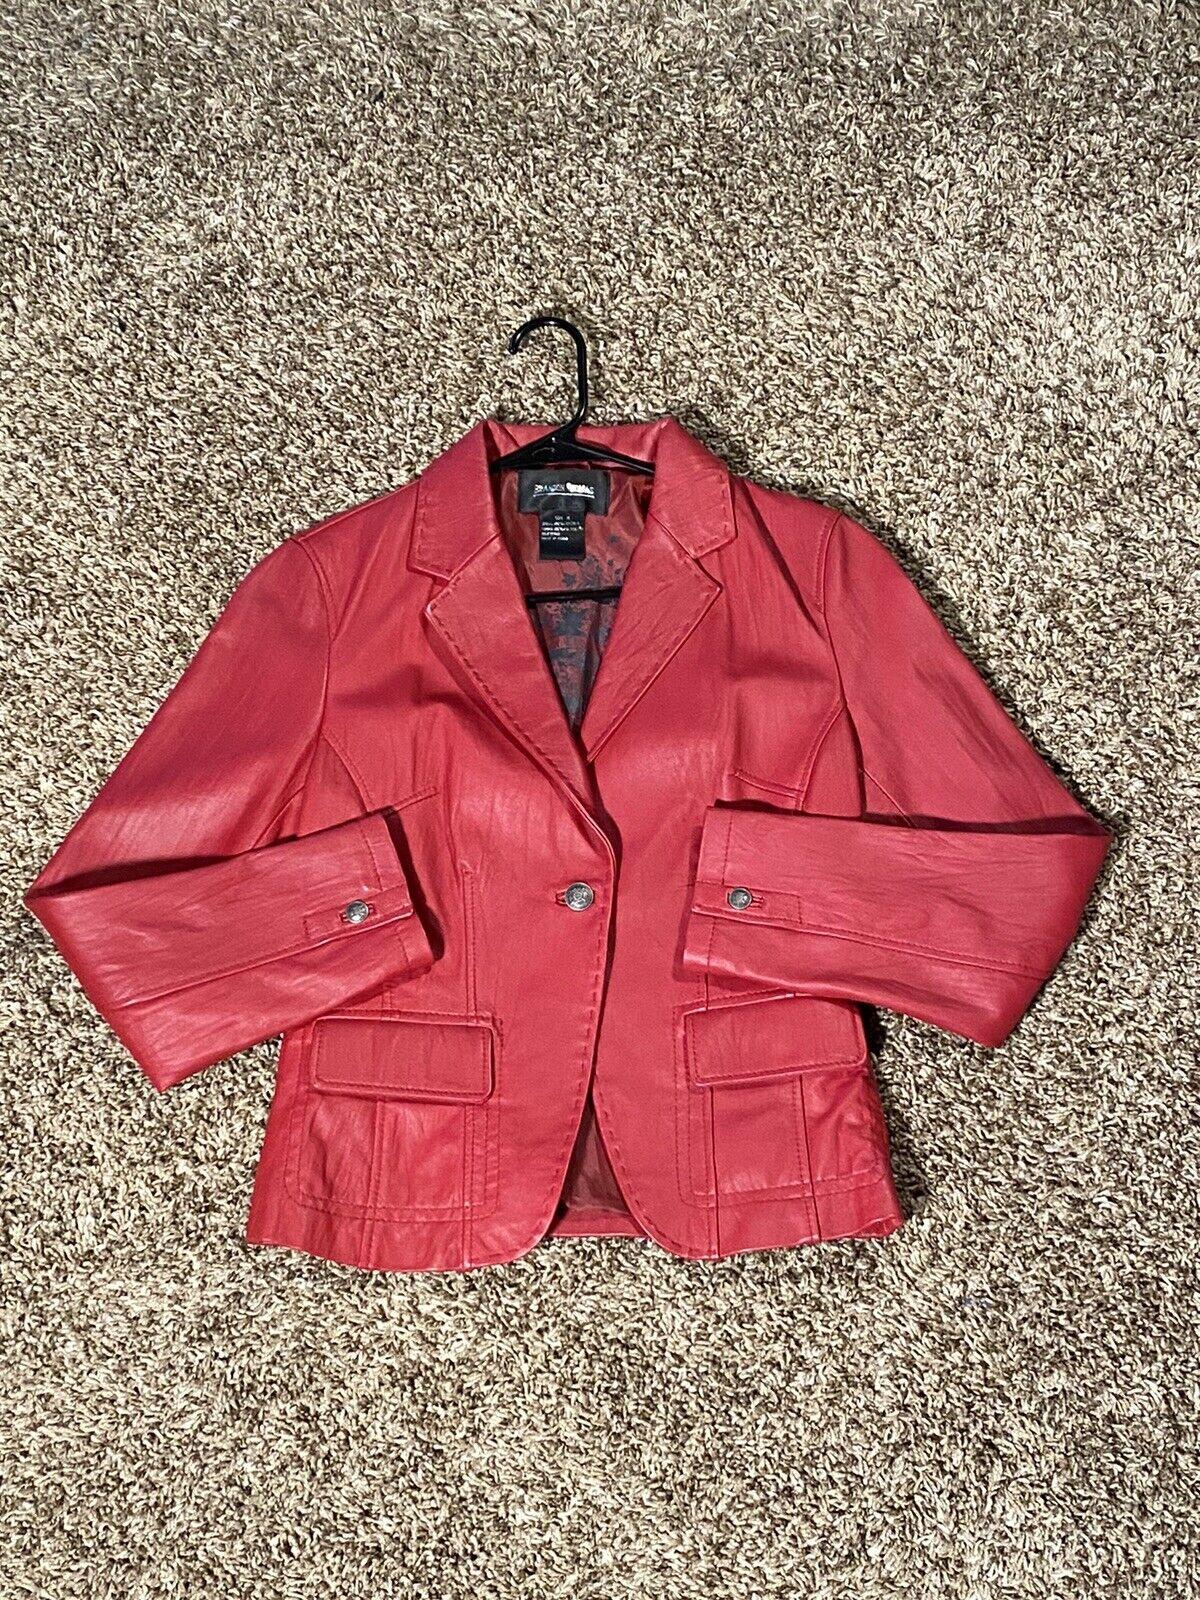 Women's Brandon Thomas Red 100% Leather Jacket - Medium